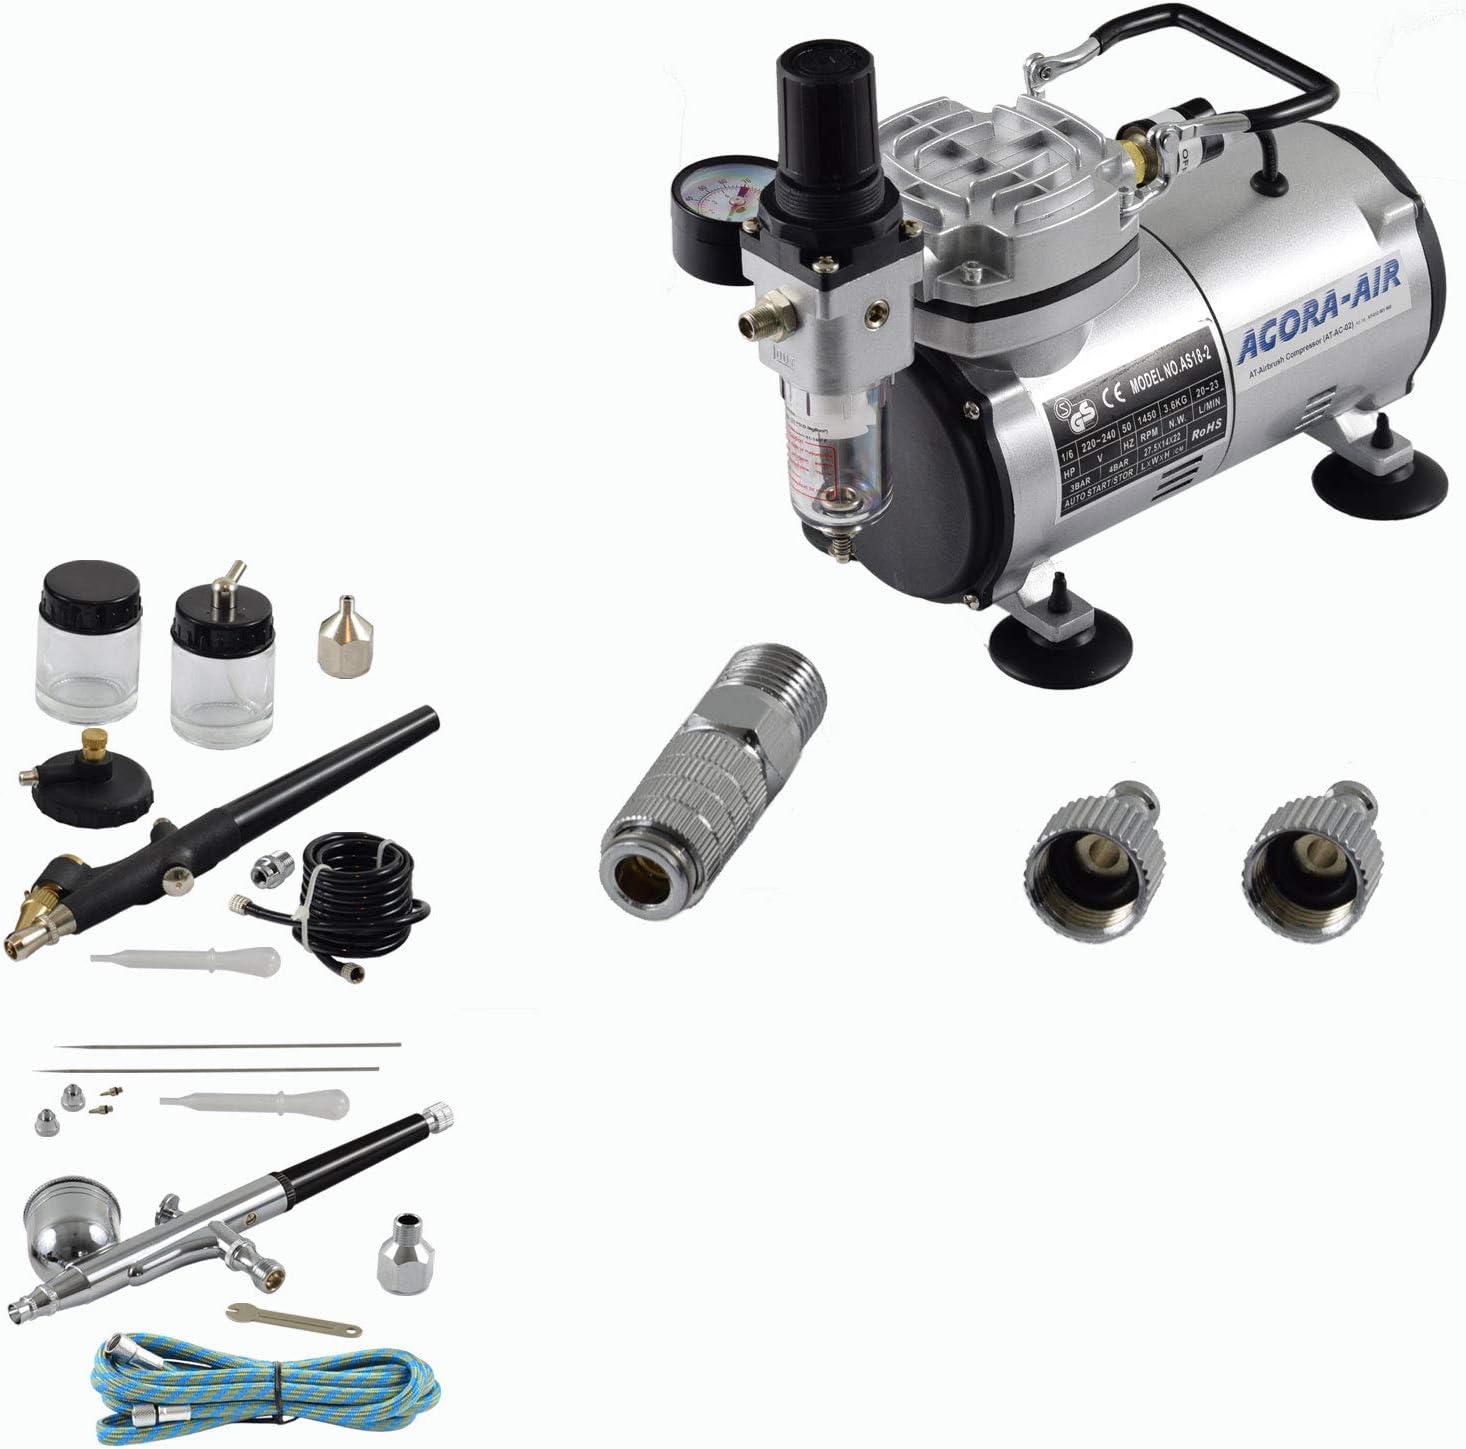 Agora Tec Airbrush Komplett Set Expert I 1 Inkl Kompressor Mit 4 Bar 20l Min 2 Airbrushpistolen Mit 0 2 0 3 0 5 0 8mm Nadeln Düsen 2 Schnellkupplungen 1 Schlauch Adapter Baumarkt